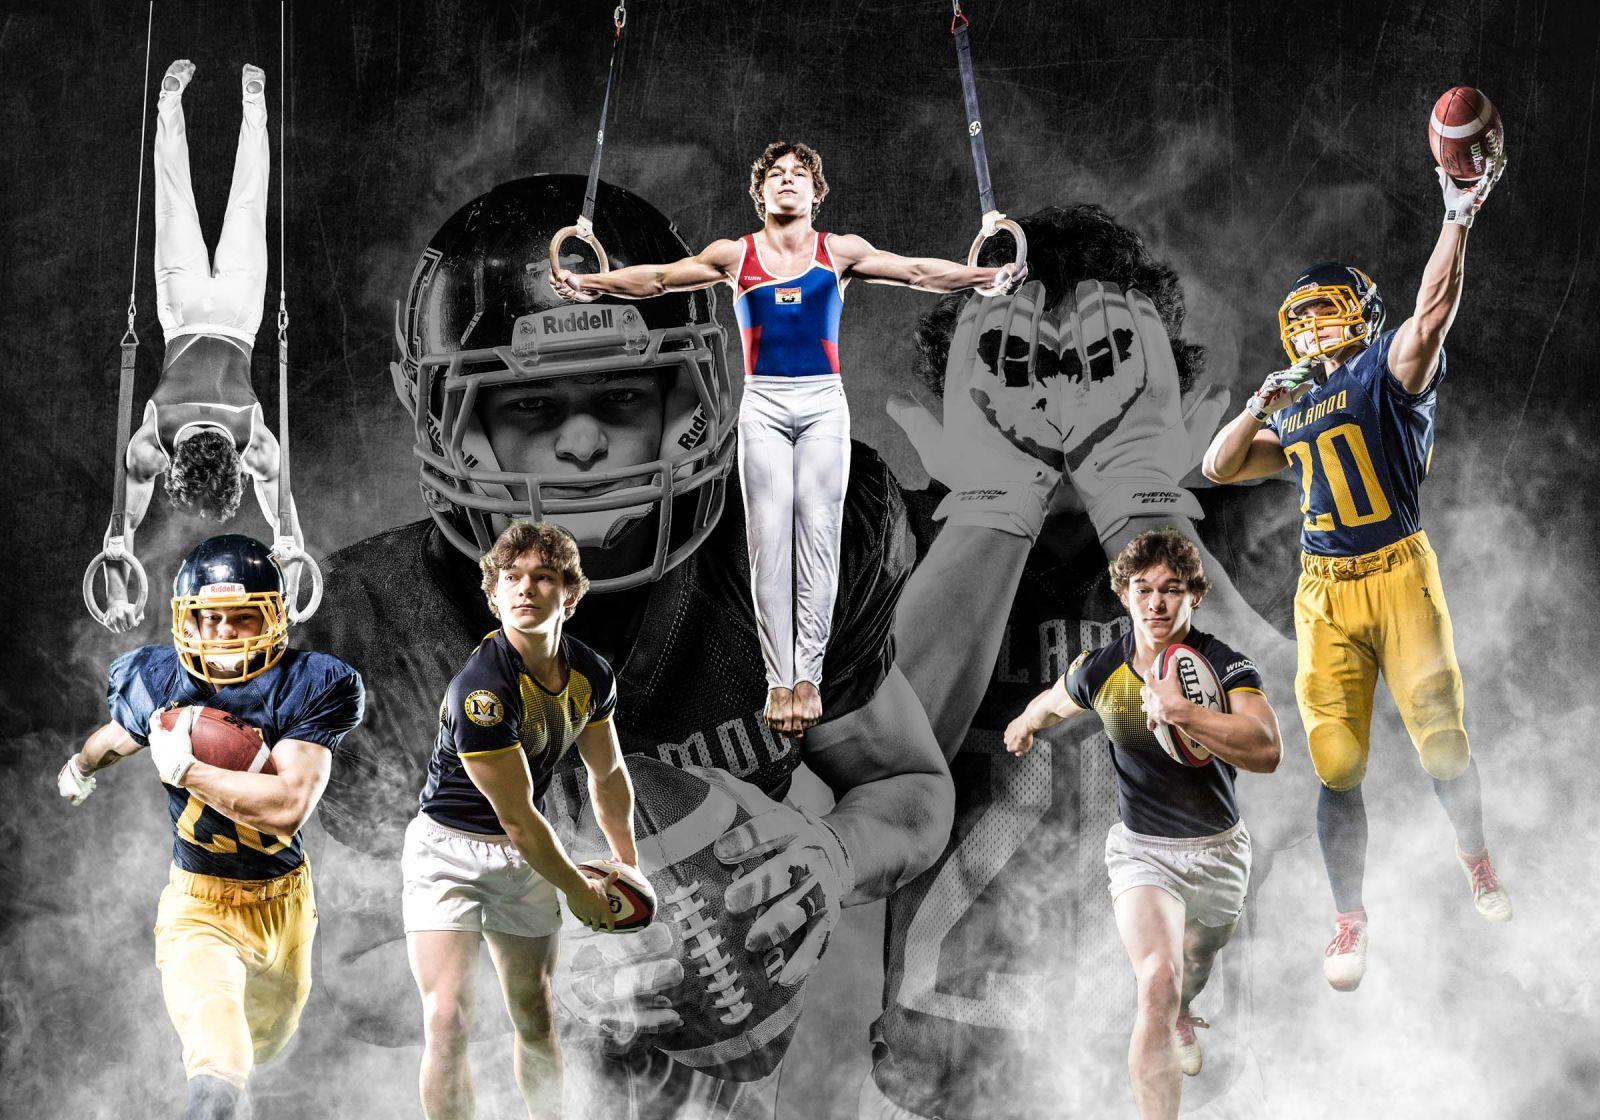 Miramichi sports graduation photo composite